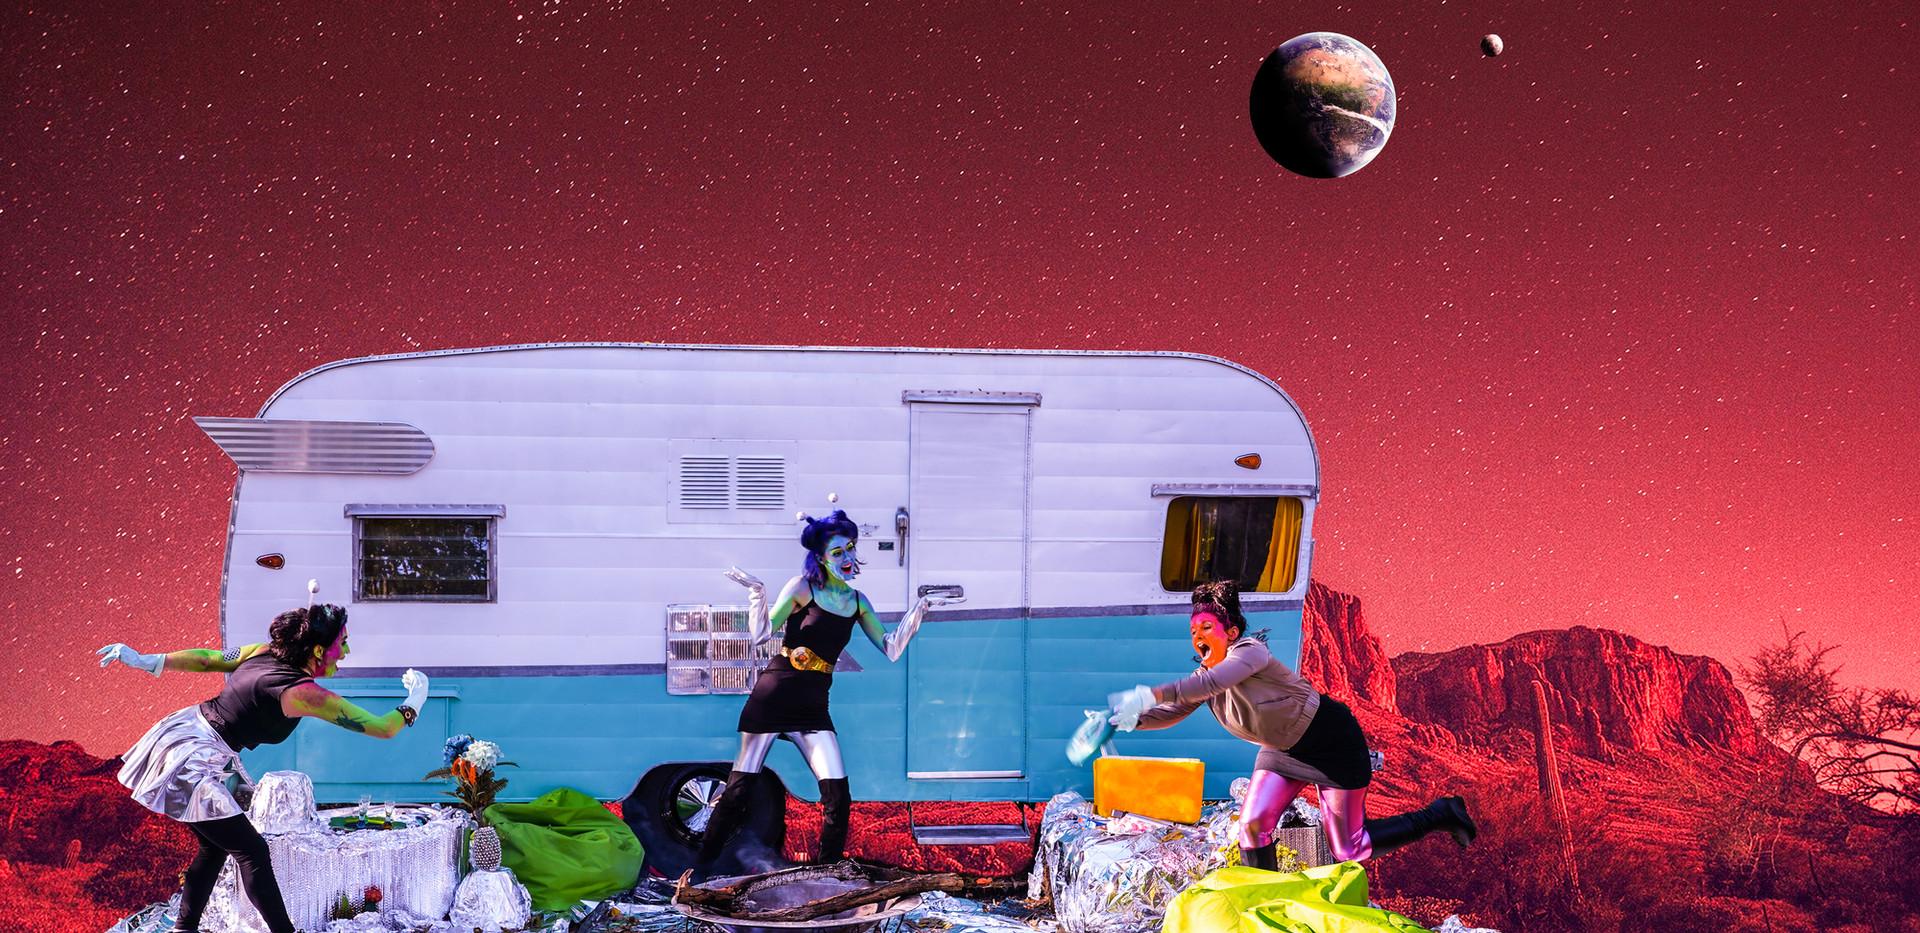 Alien babes take The Mothership to Mars